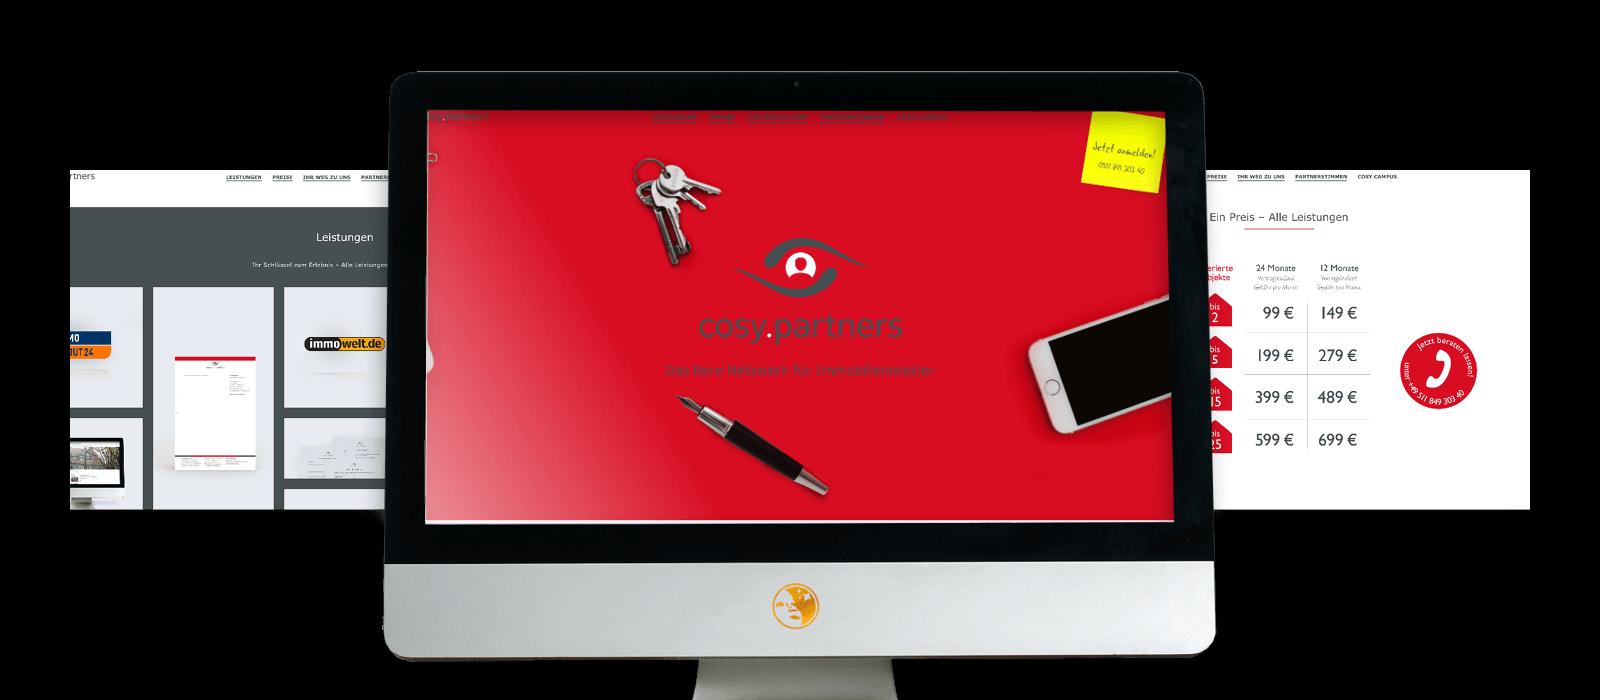 Agentur Goldkind Cosy Partners